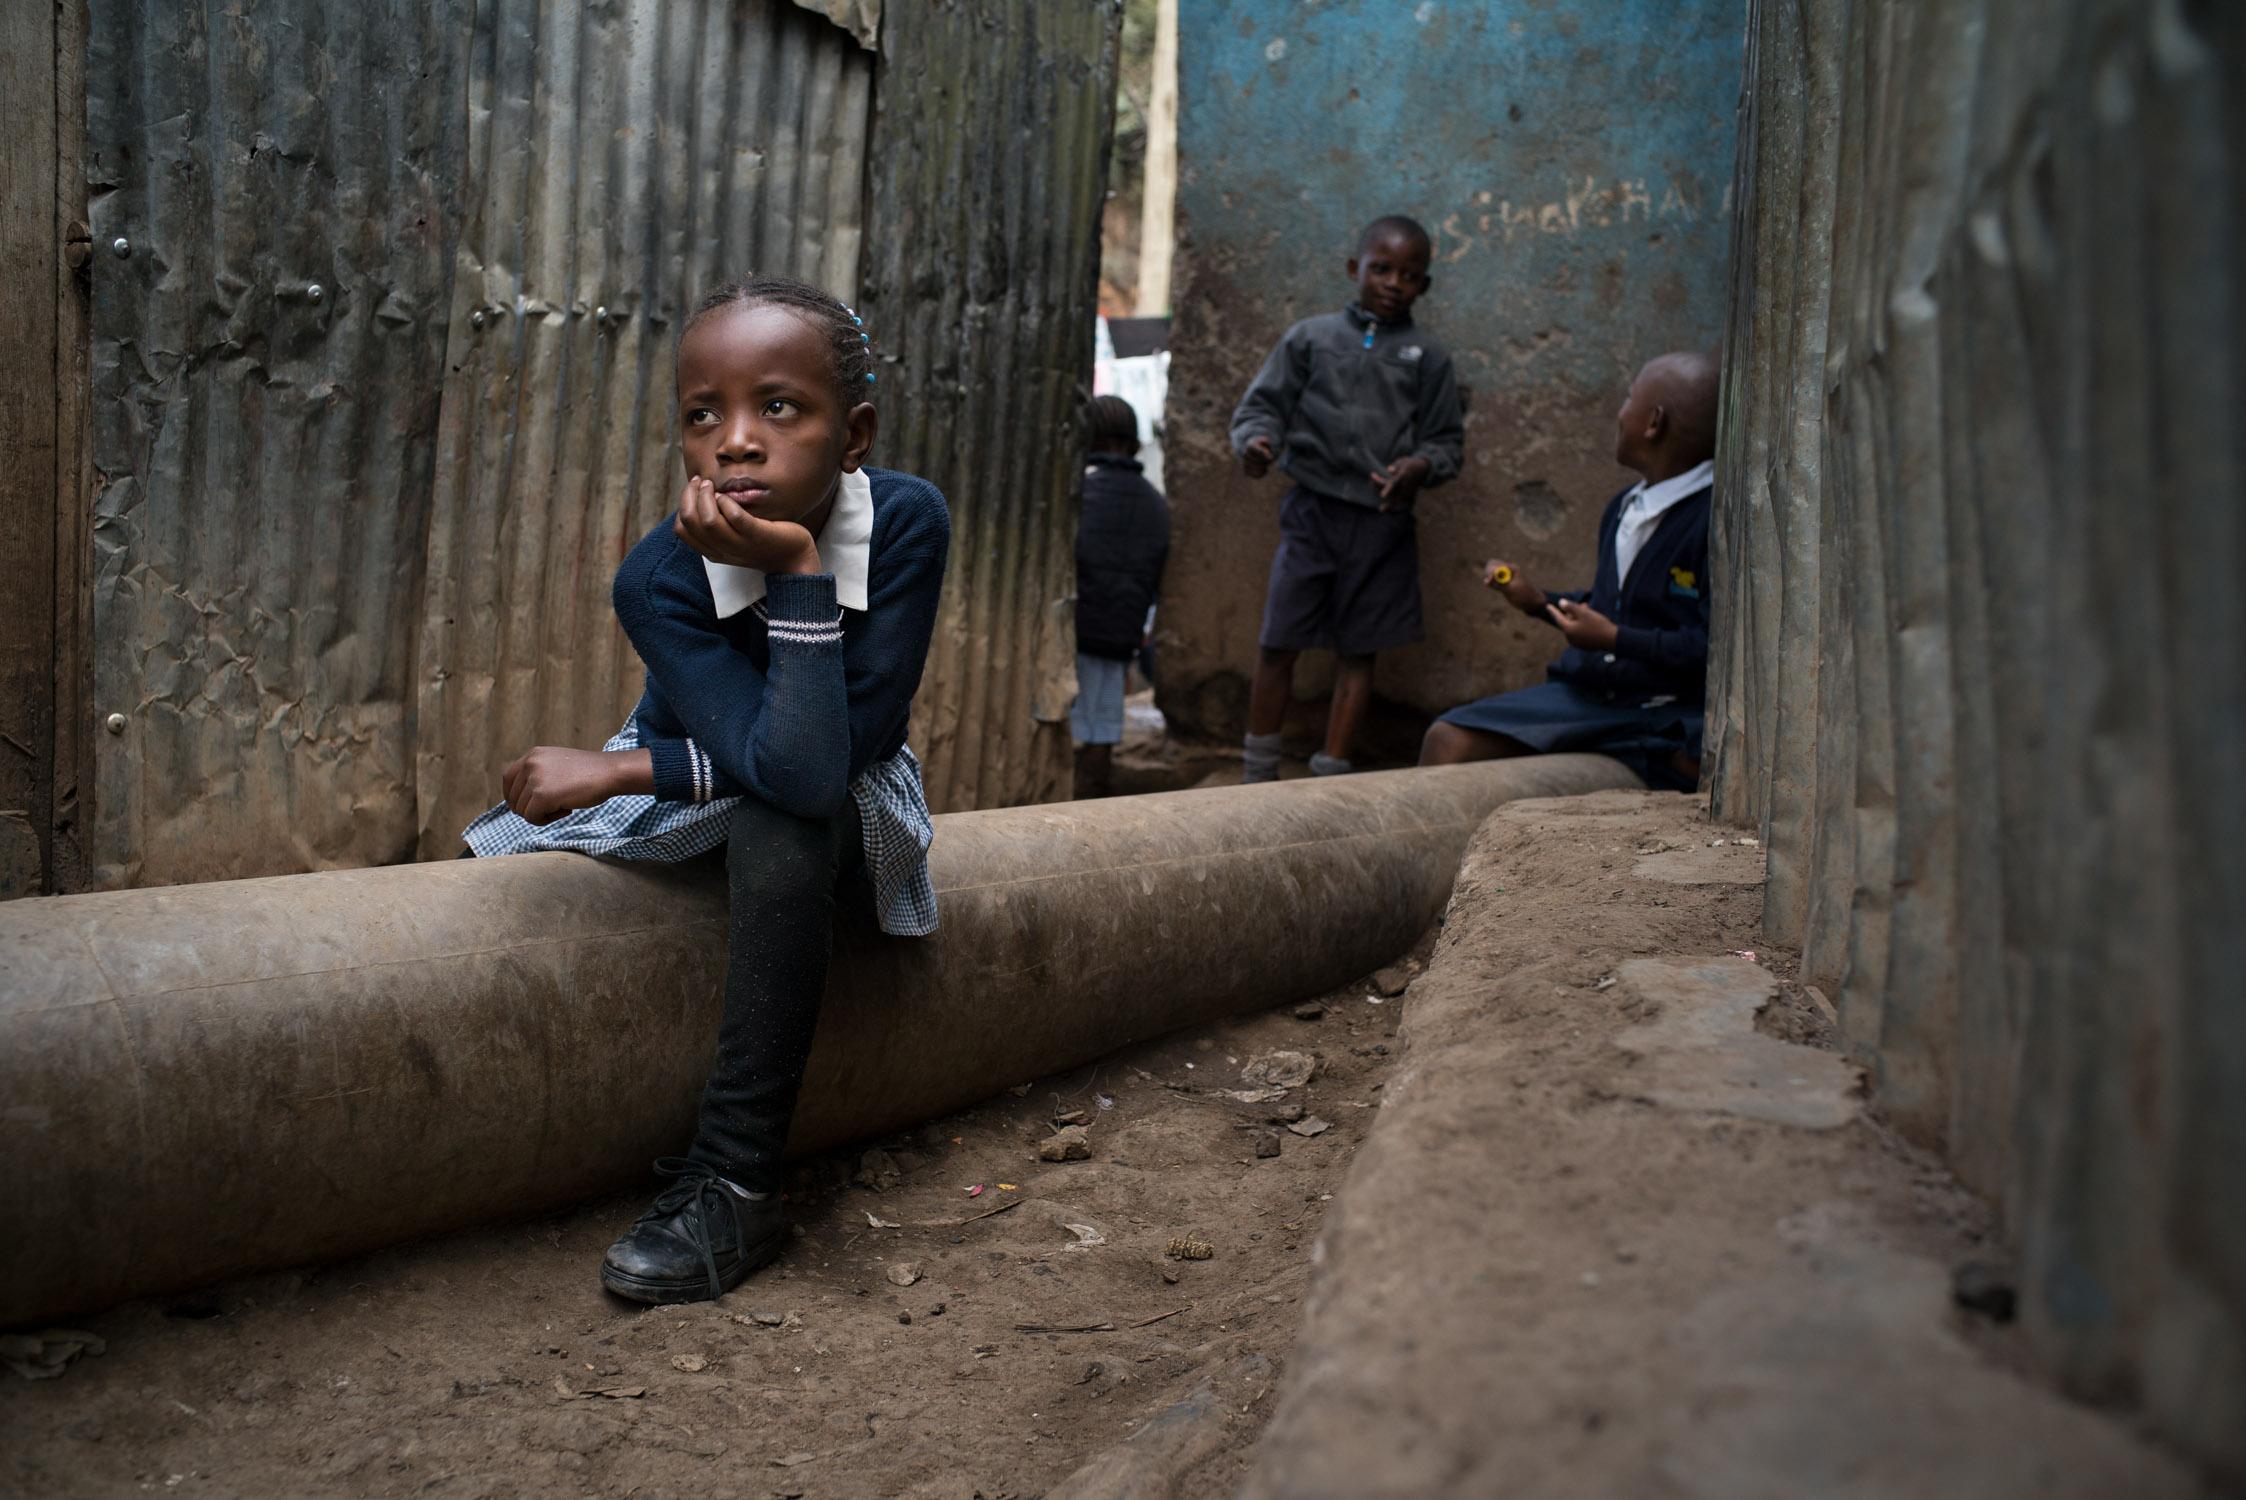 Children at a school (not Bridge) in Mathare slum area of Nairobi. September 19, 2016. Mathare slum, Nairobi, Kenya.